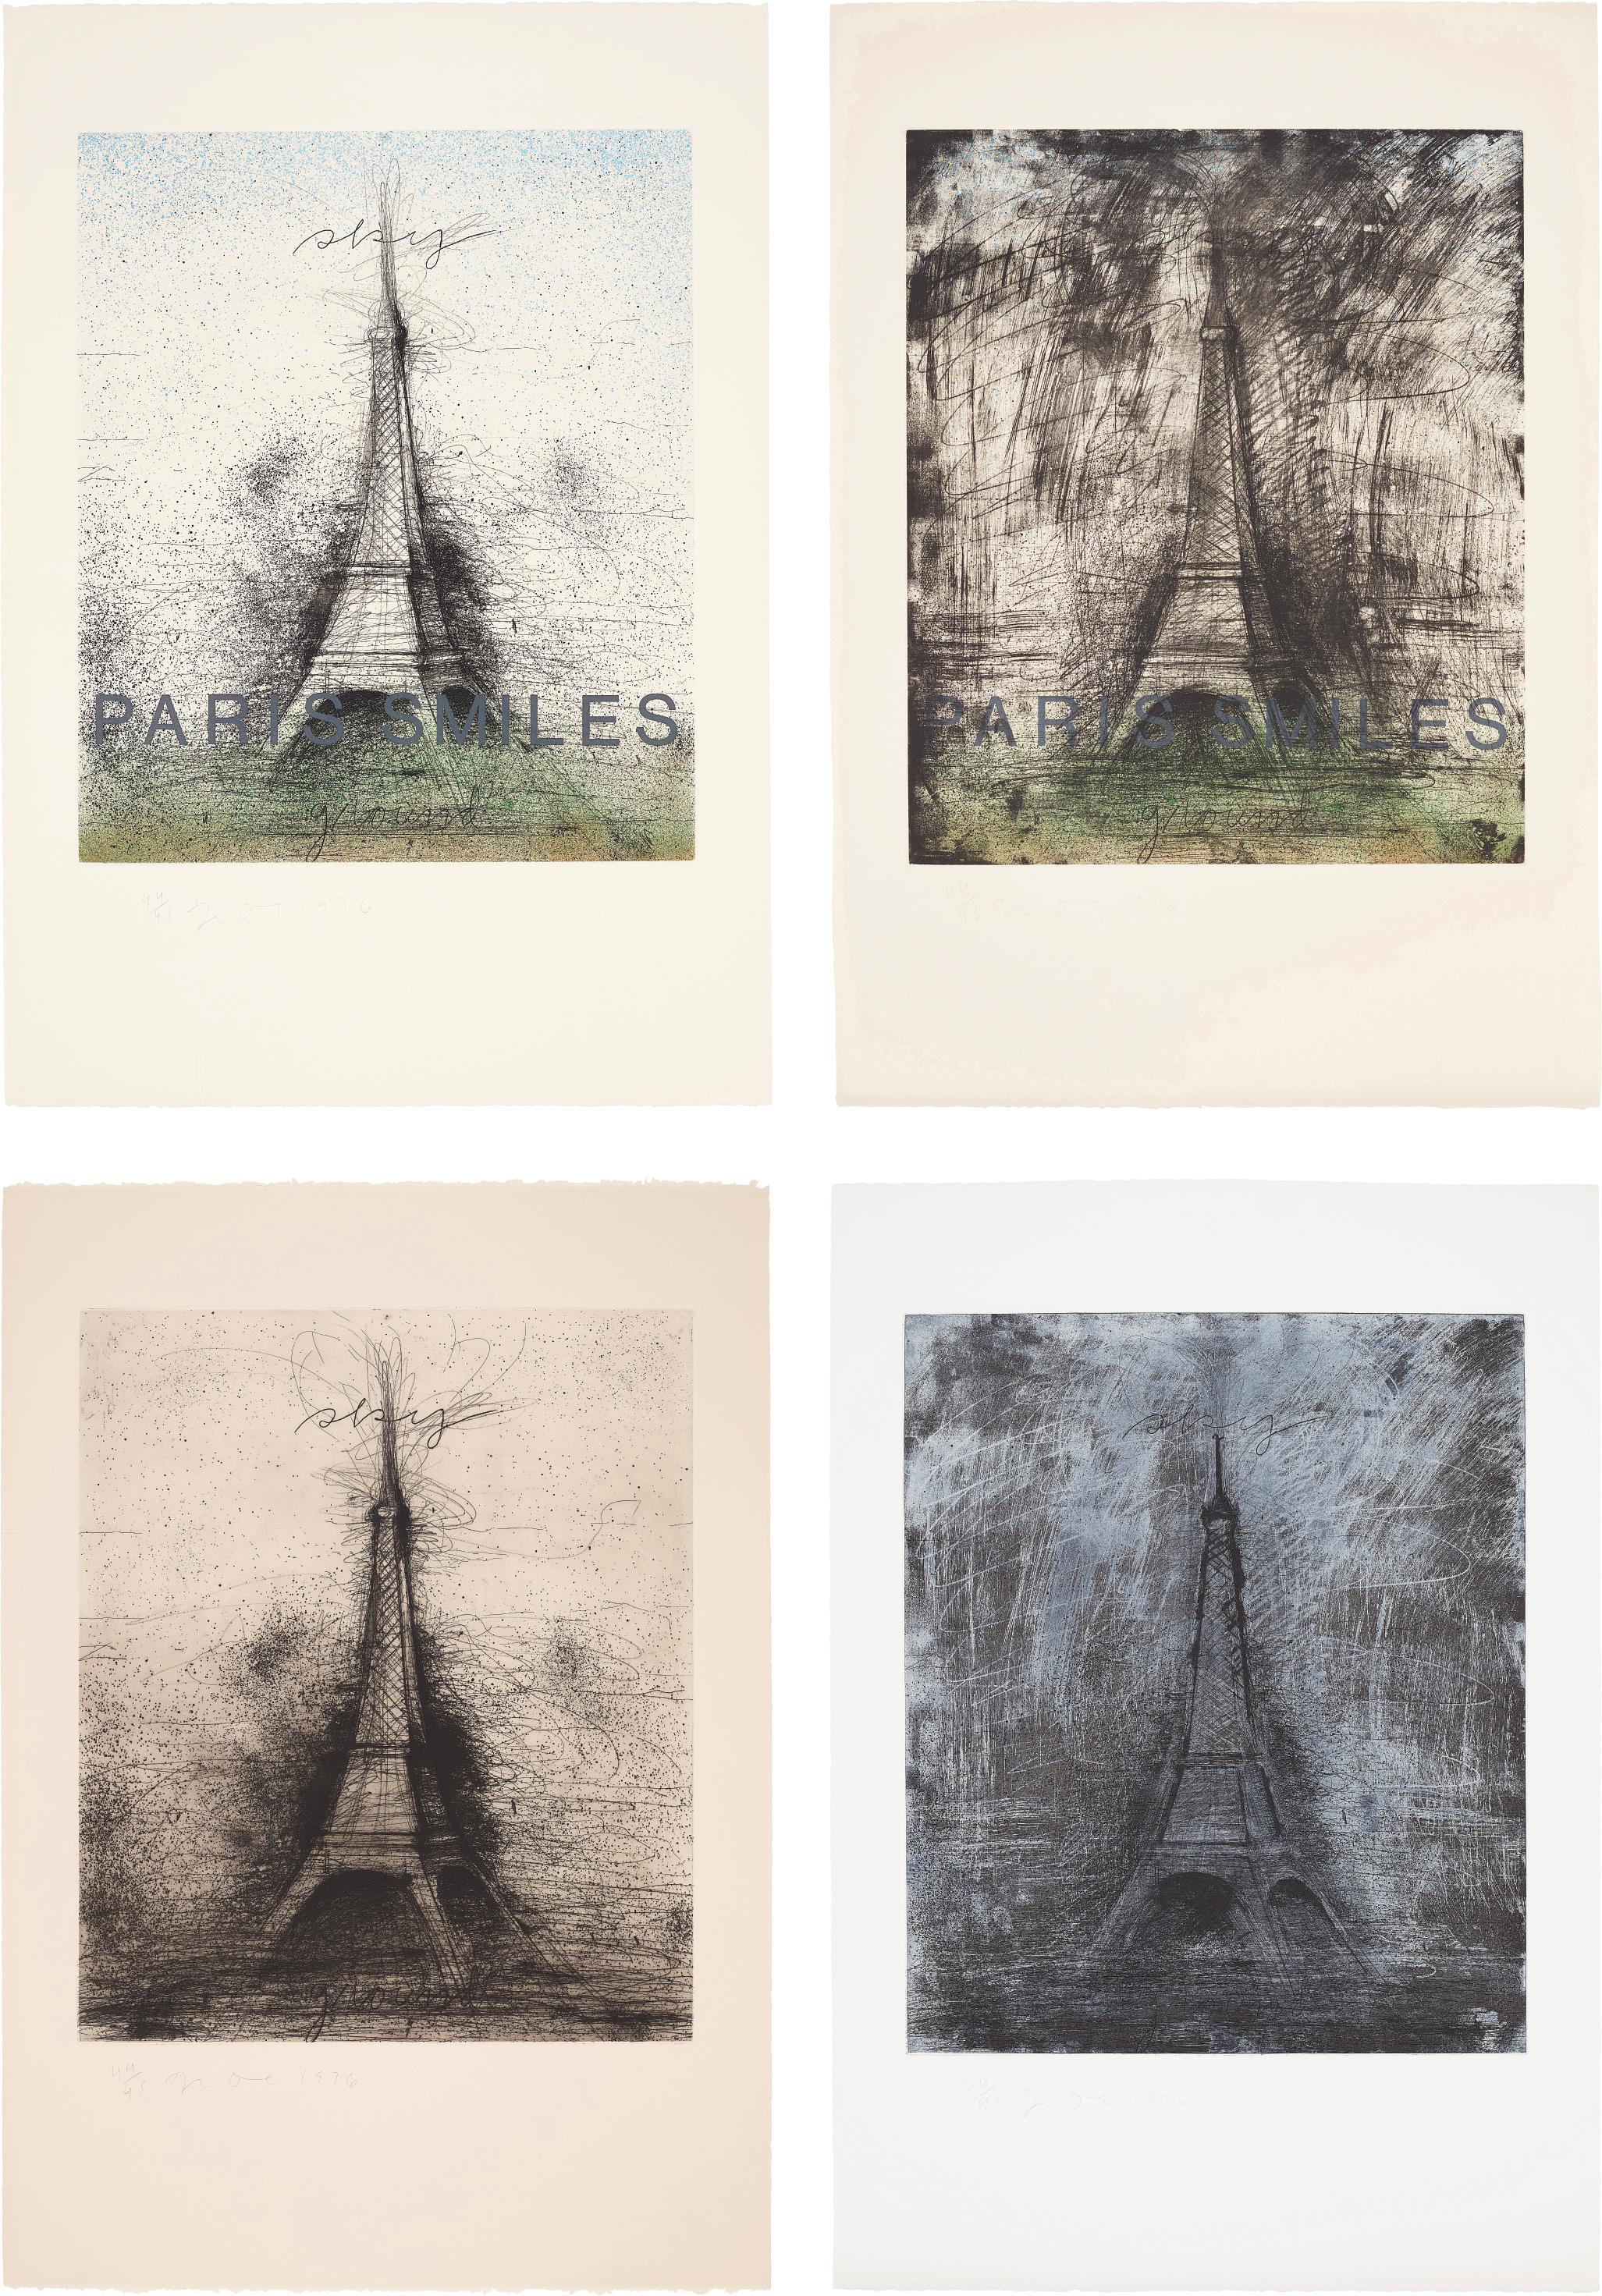 Jim Dine-Paris Smiles; Paris Smiles In Darkness; Retroussage Eiffel Tower; And Drypoint Eiffel Tower-1976